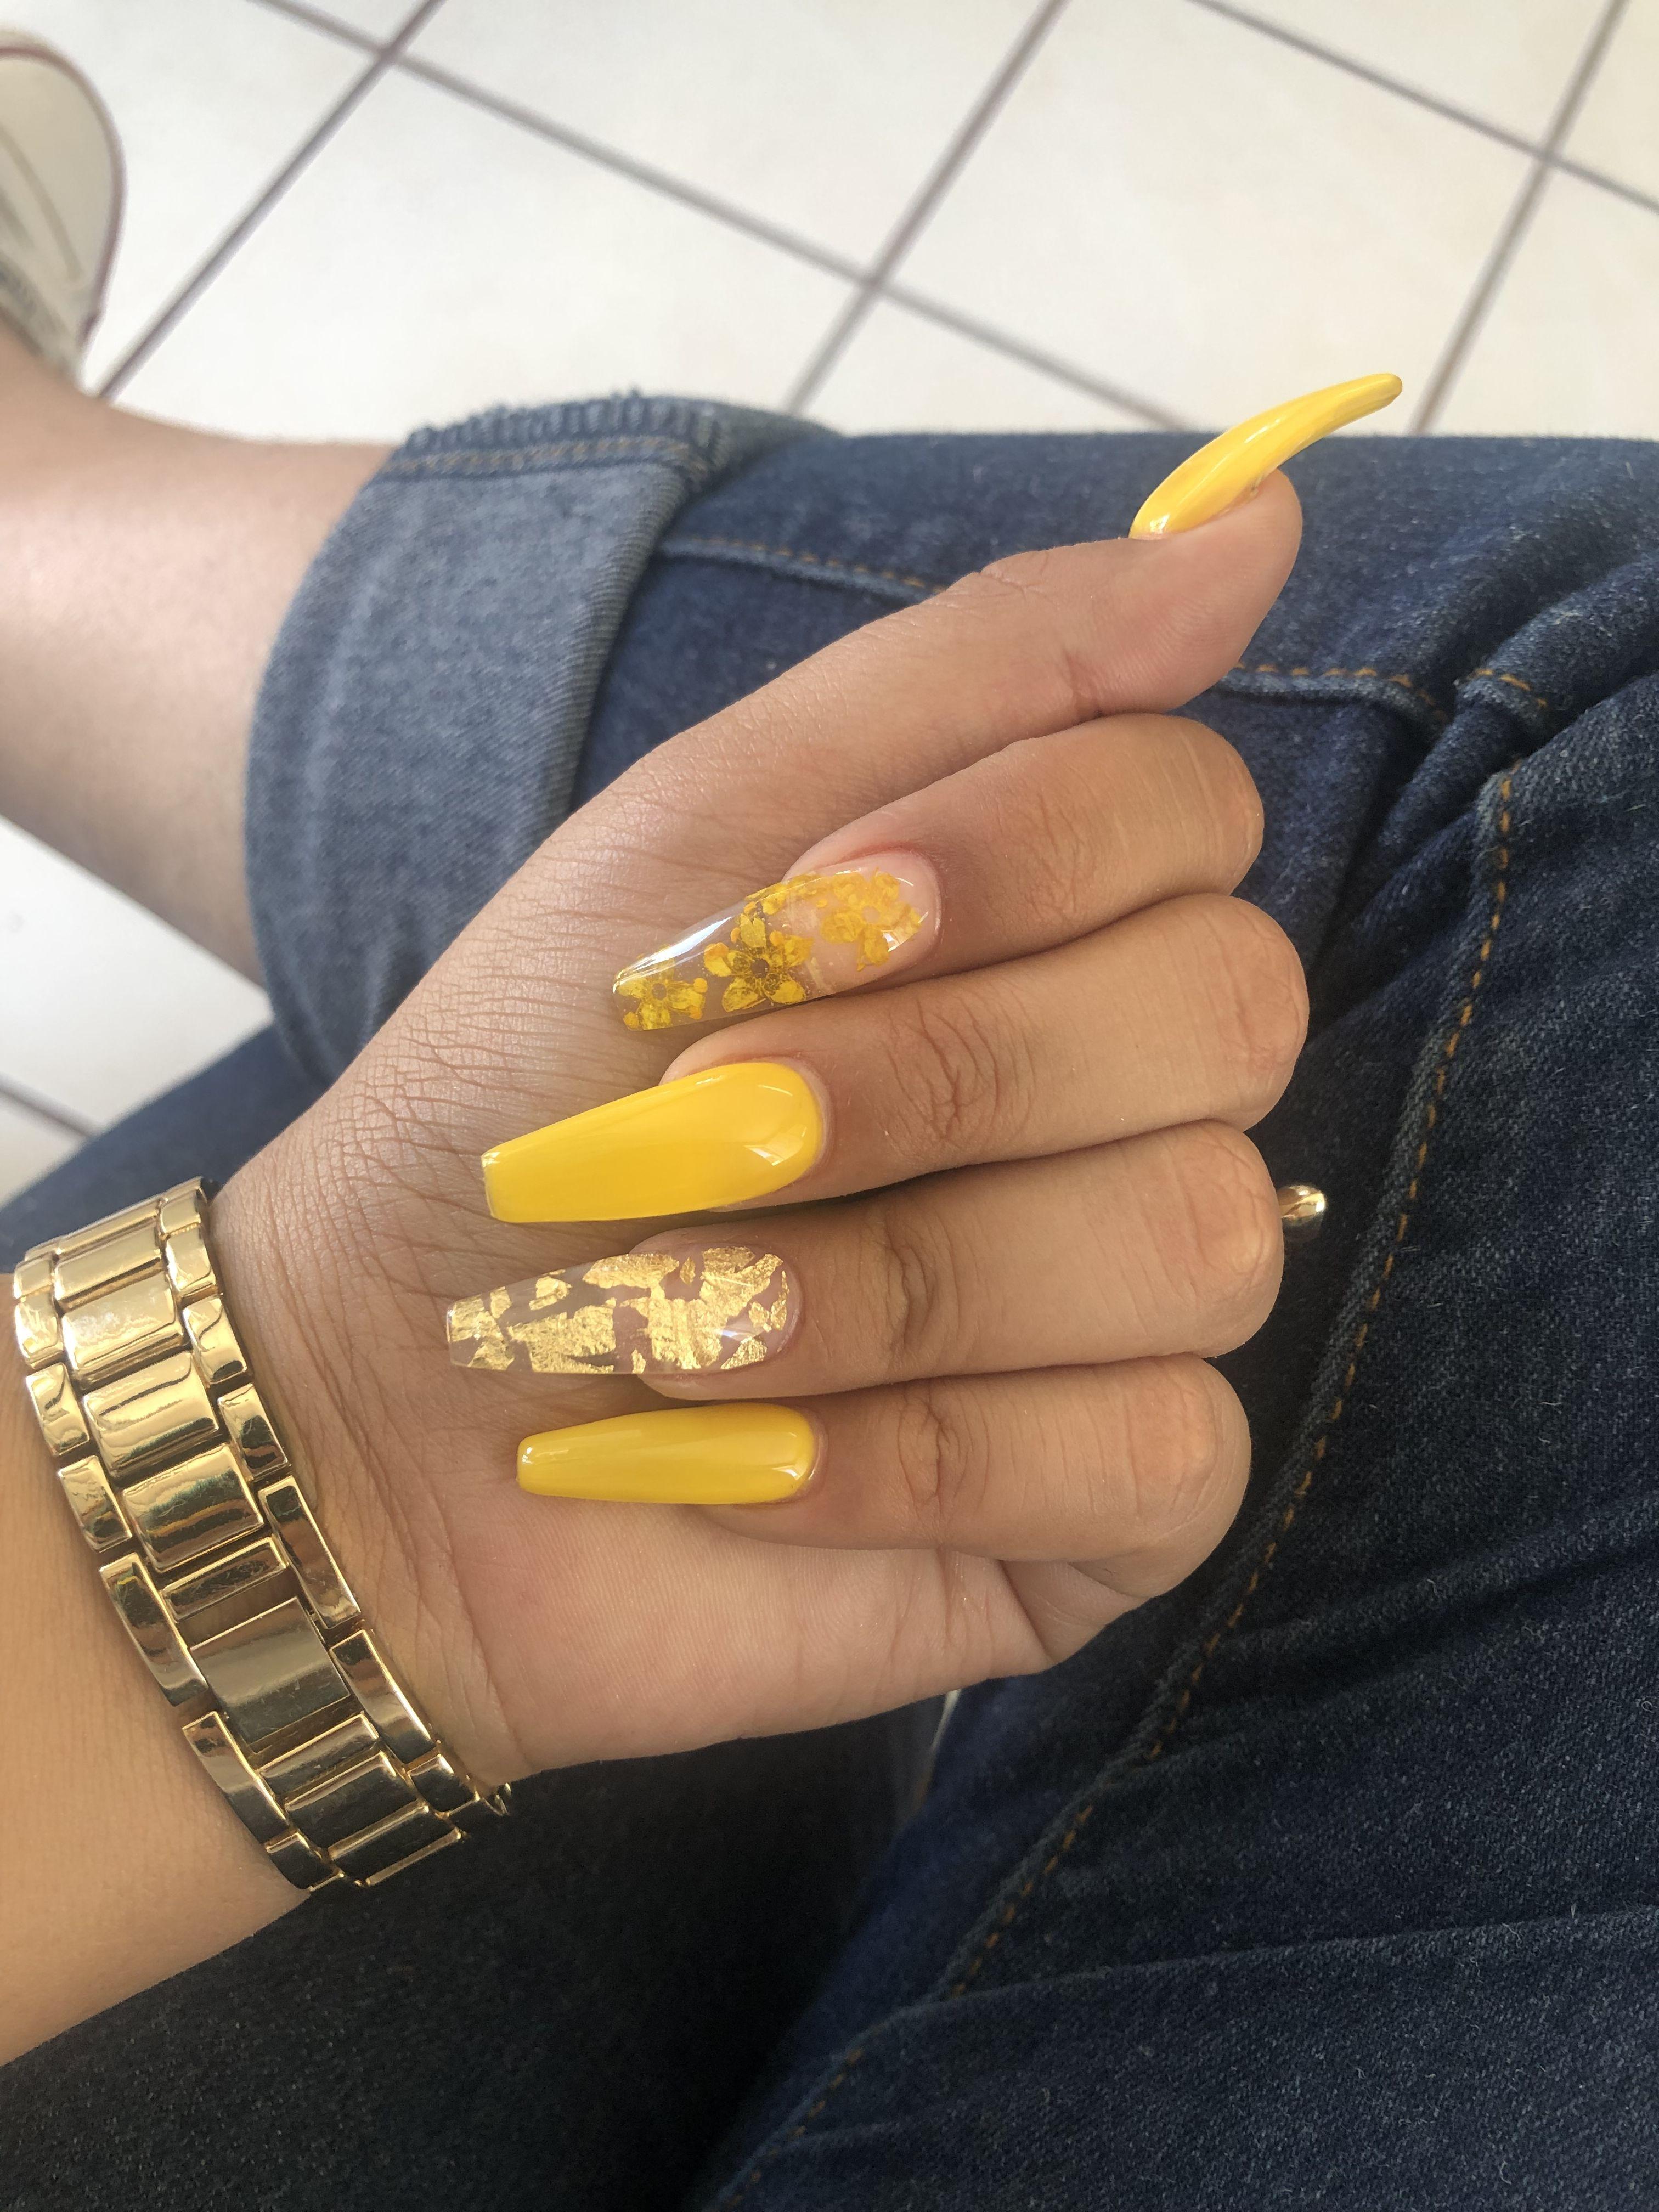 38 Summer Nail Art Designs And Colors 2019 Koees Blog Yellow Nails Design Yellow Nails Nail Designs